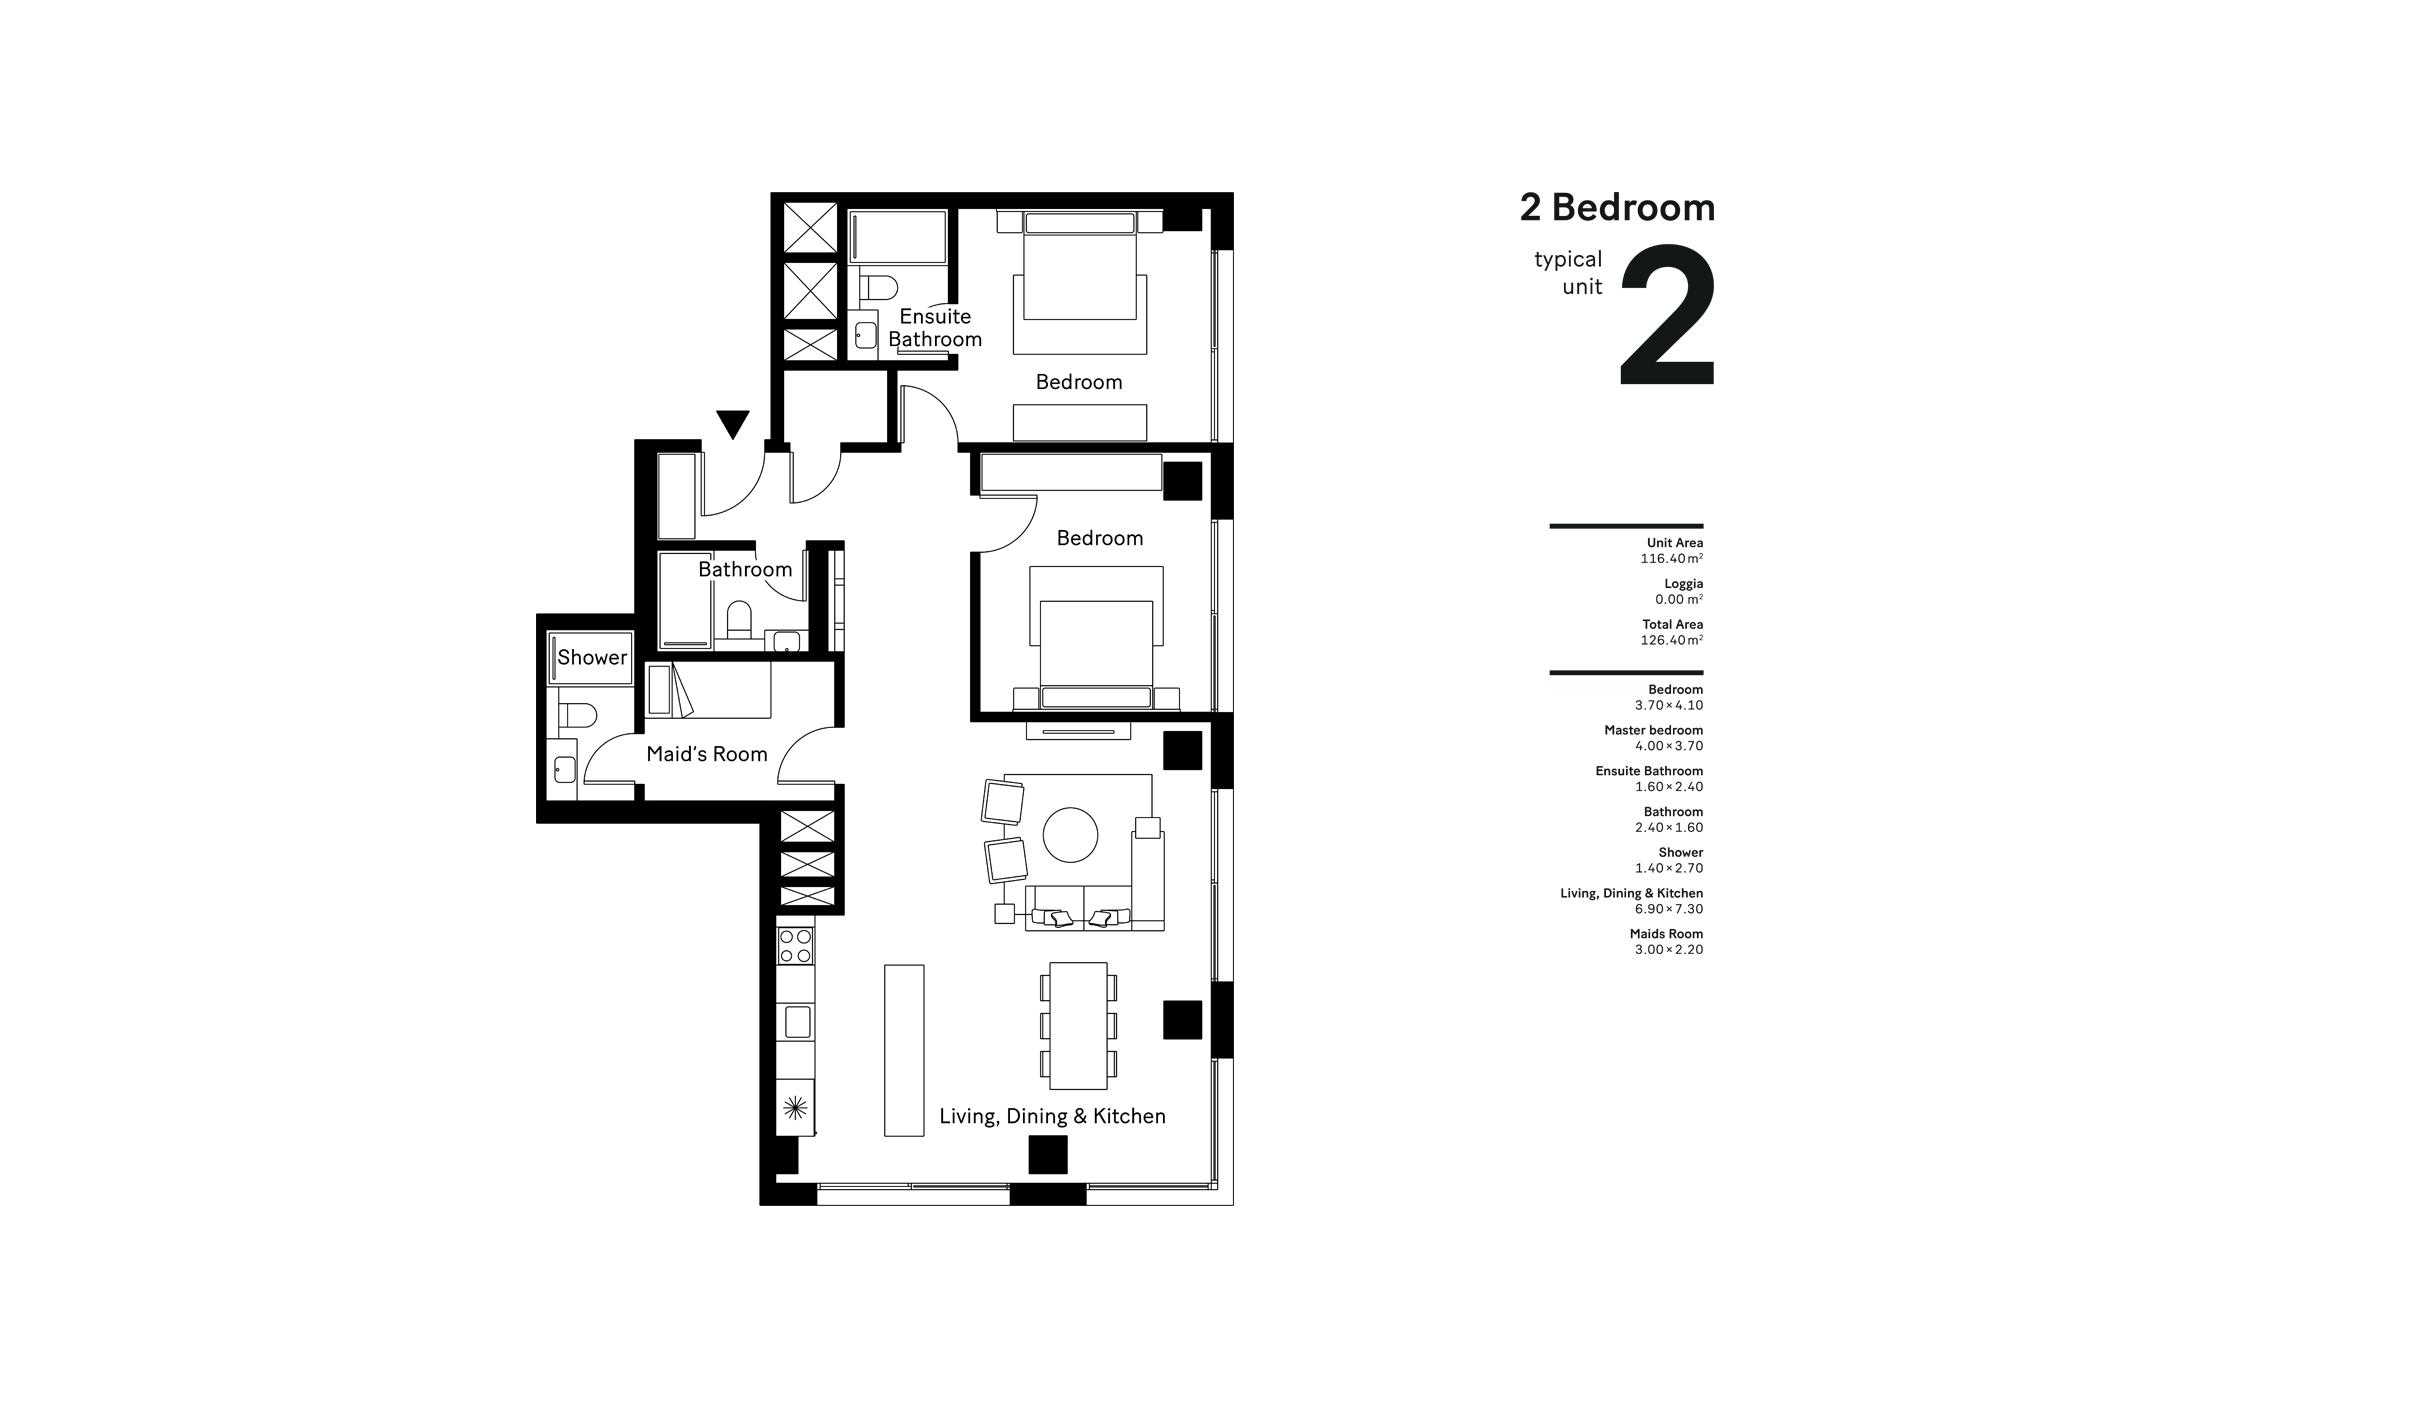 2 Bedroom  Size - 126.40 sqm